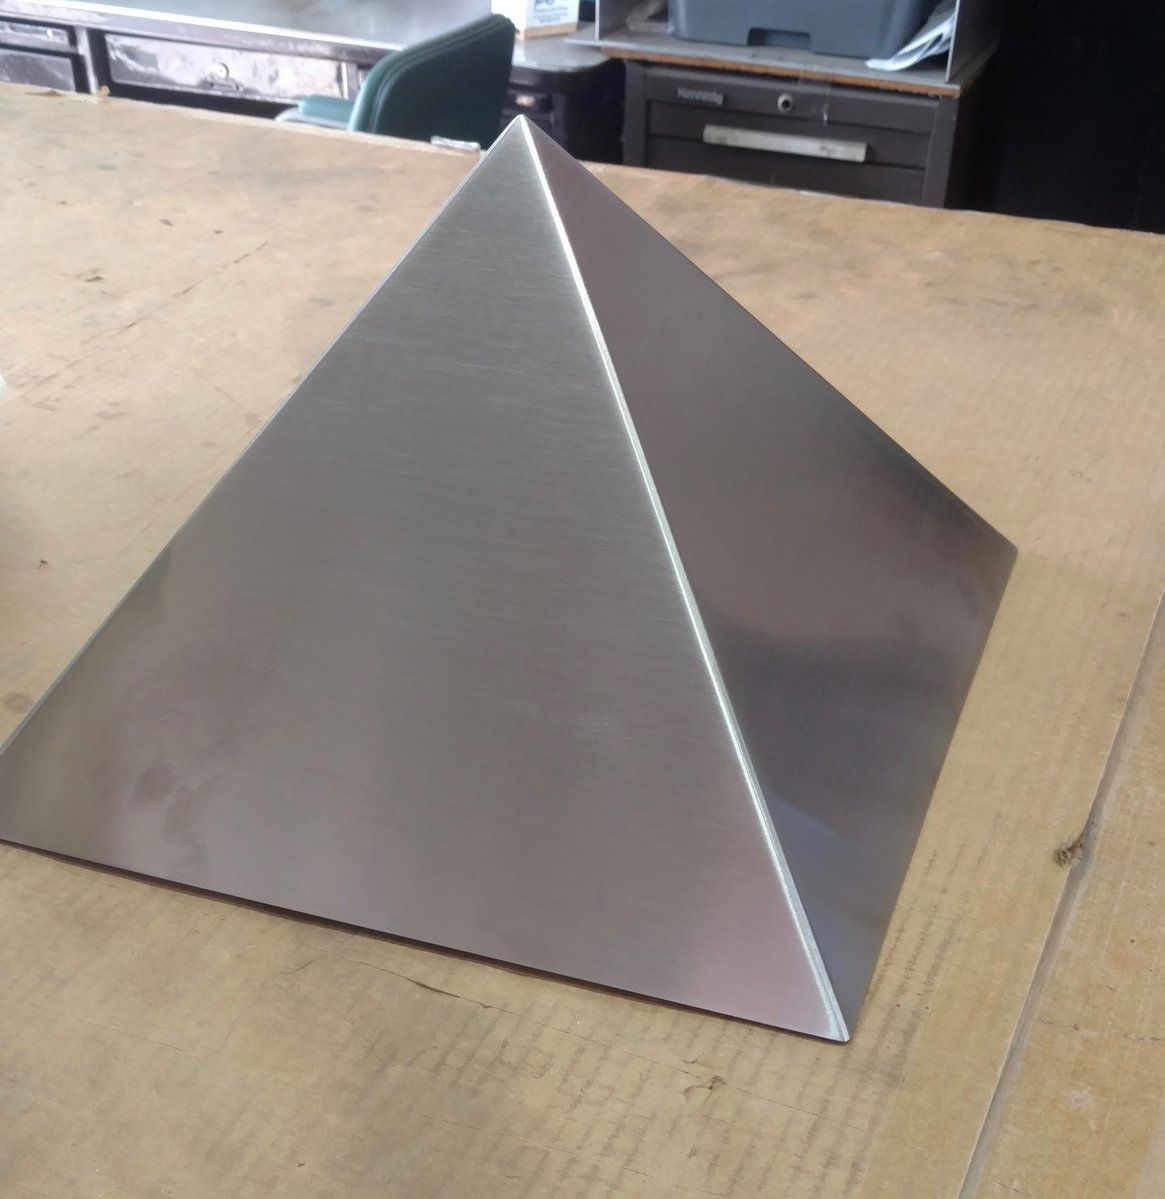 Metalscut4u metalscut4u sheet metal metal art welded